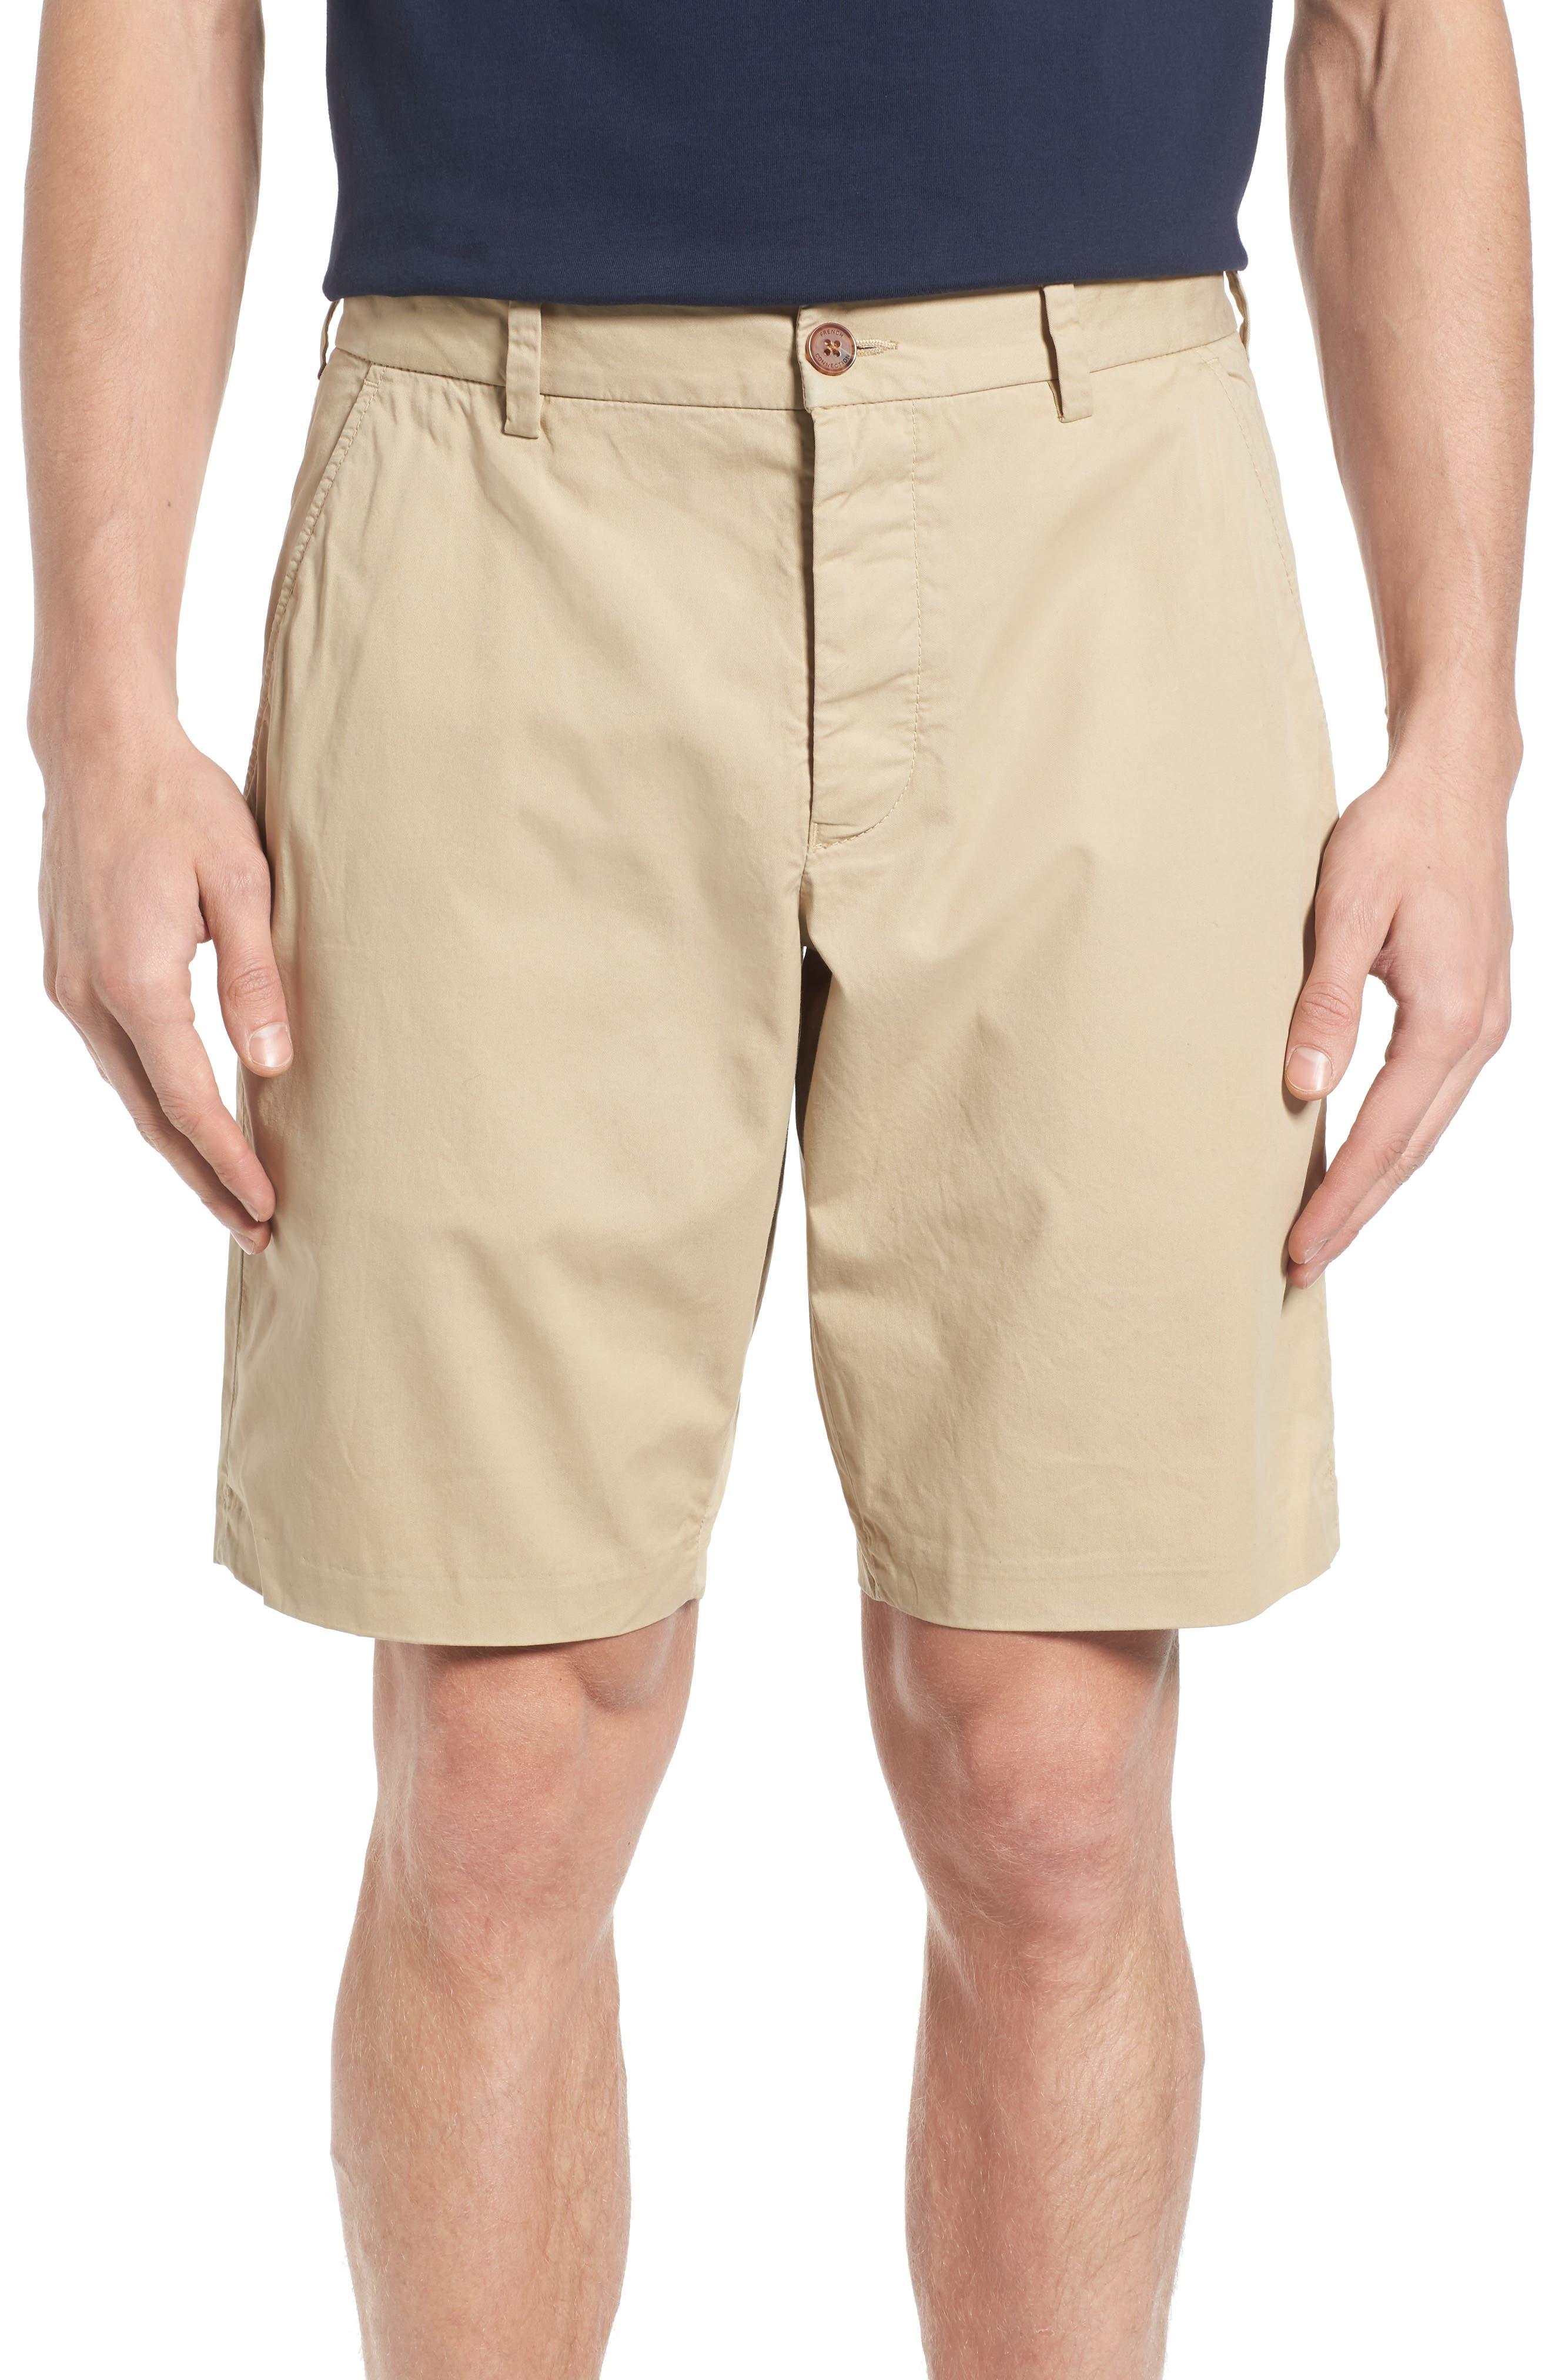 Peach Pie Flat Front Shorts,                             Main thumbnail 1, color,                             260